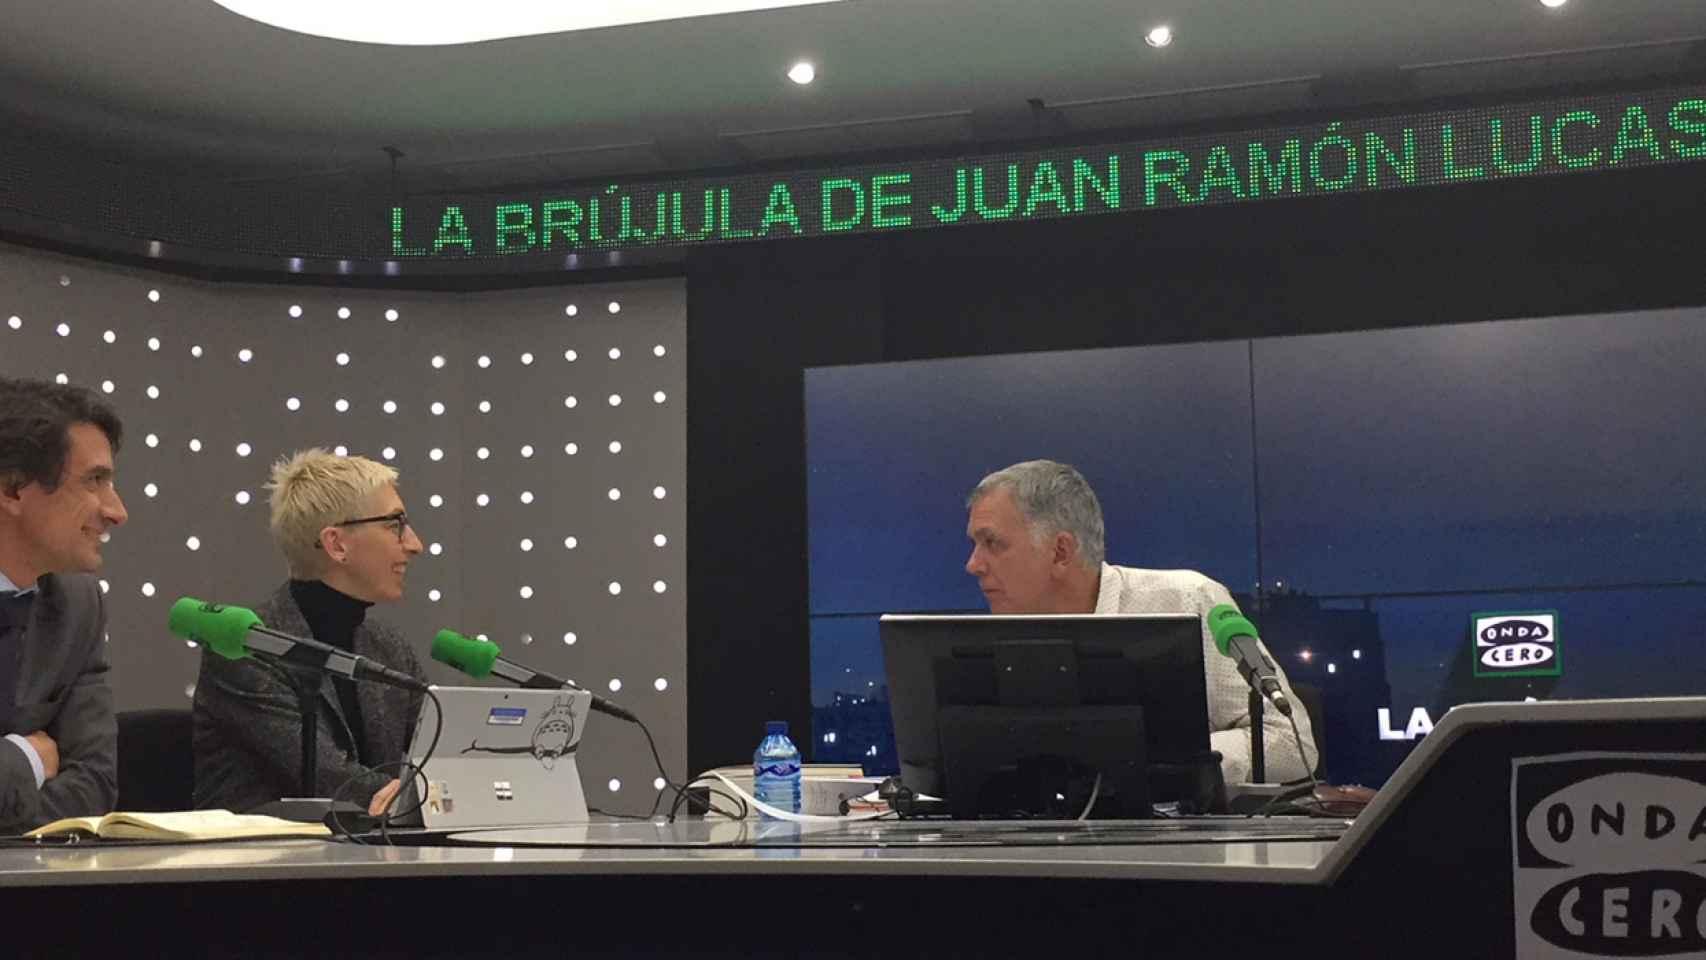 Innovar para vivir: Accenture y Metro Madrid